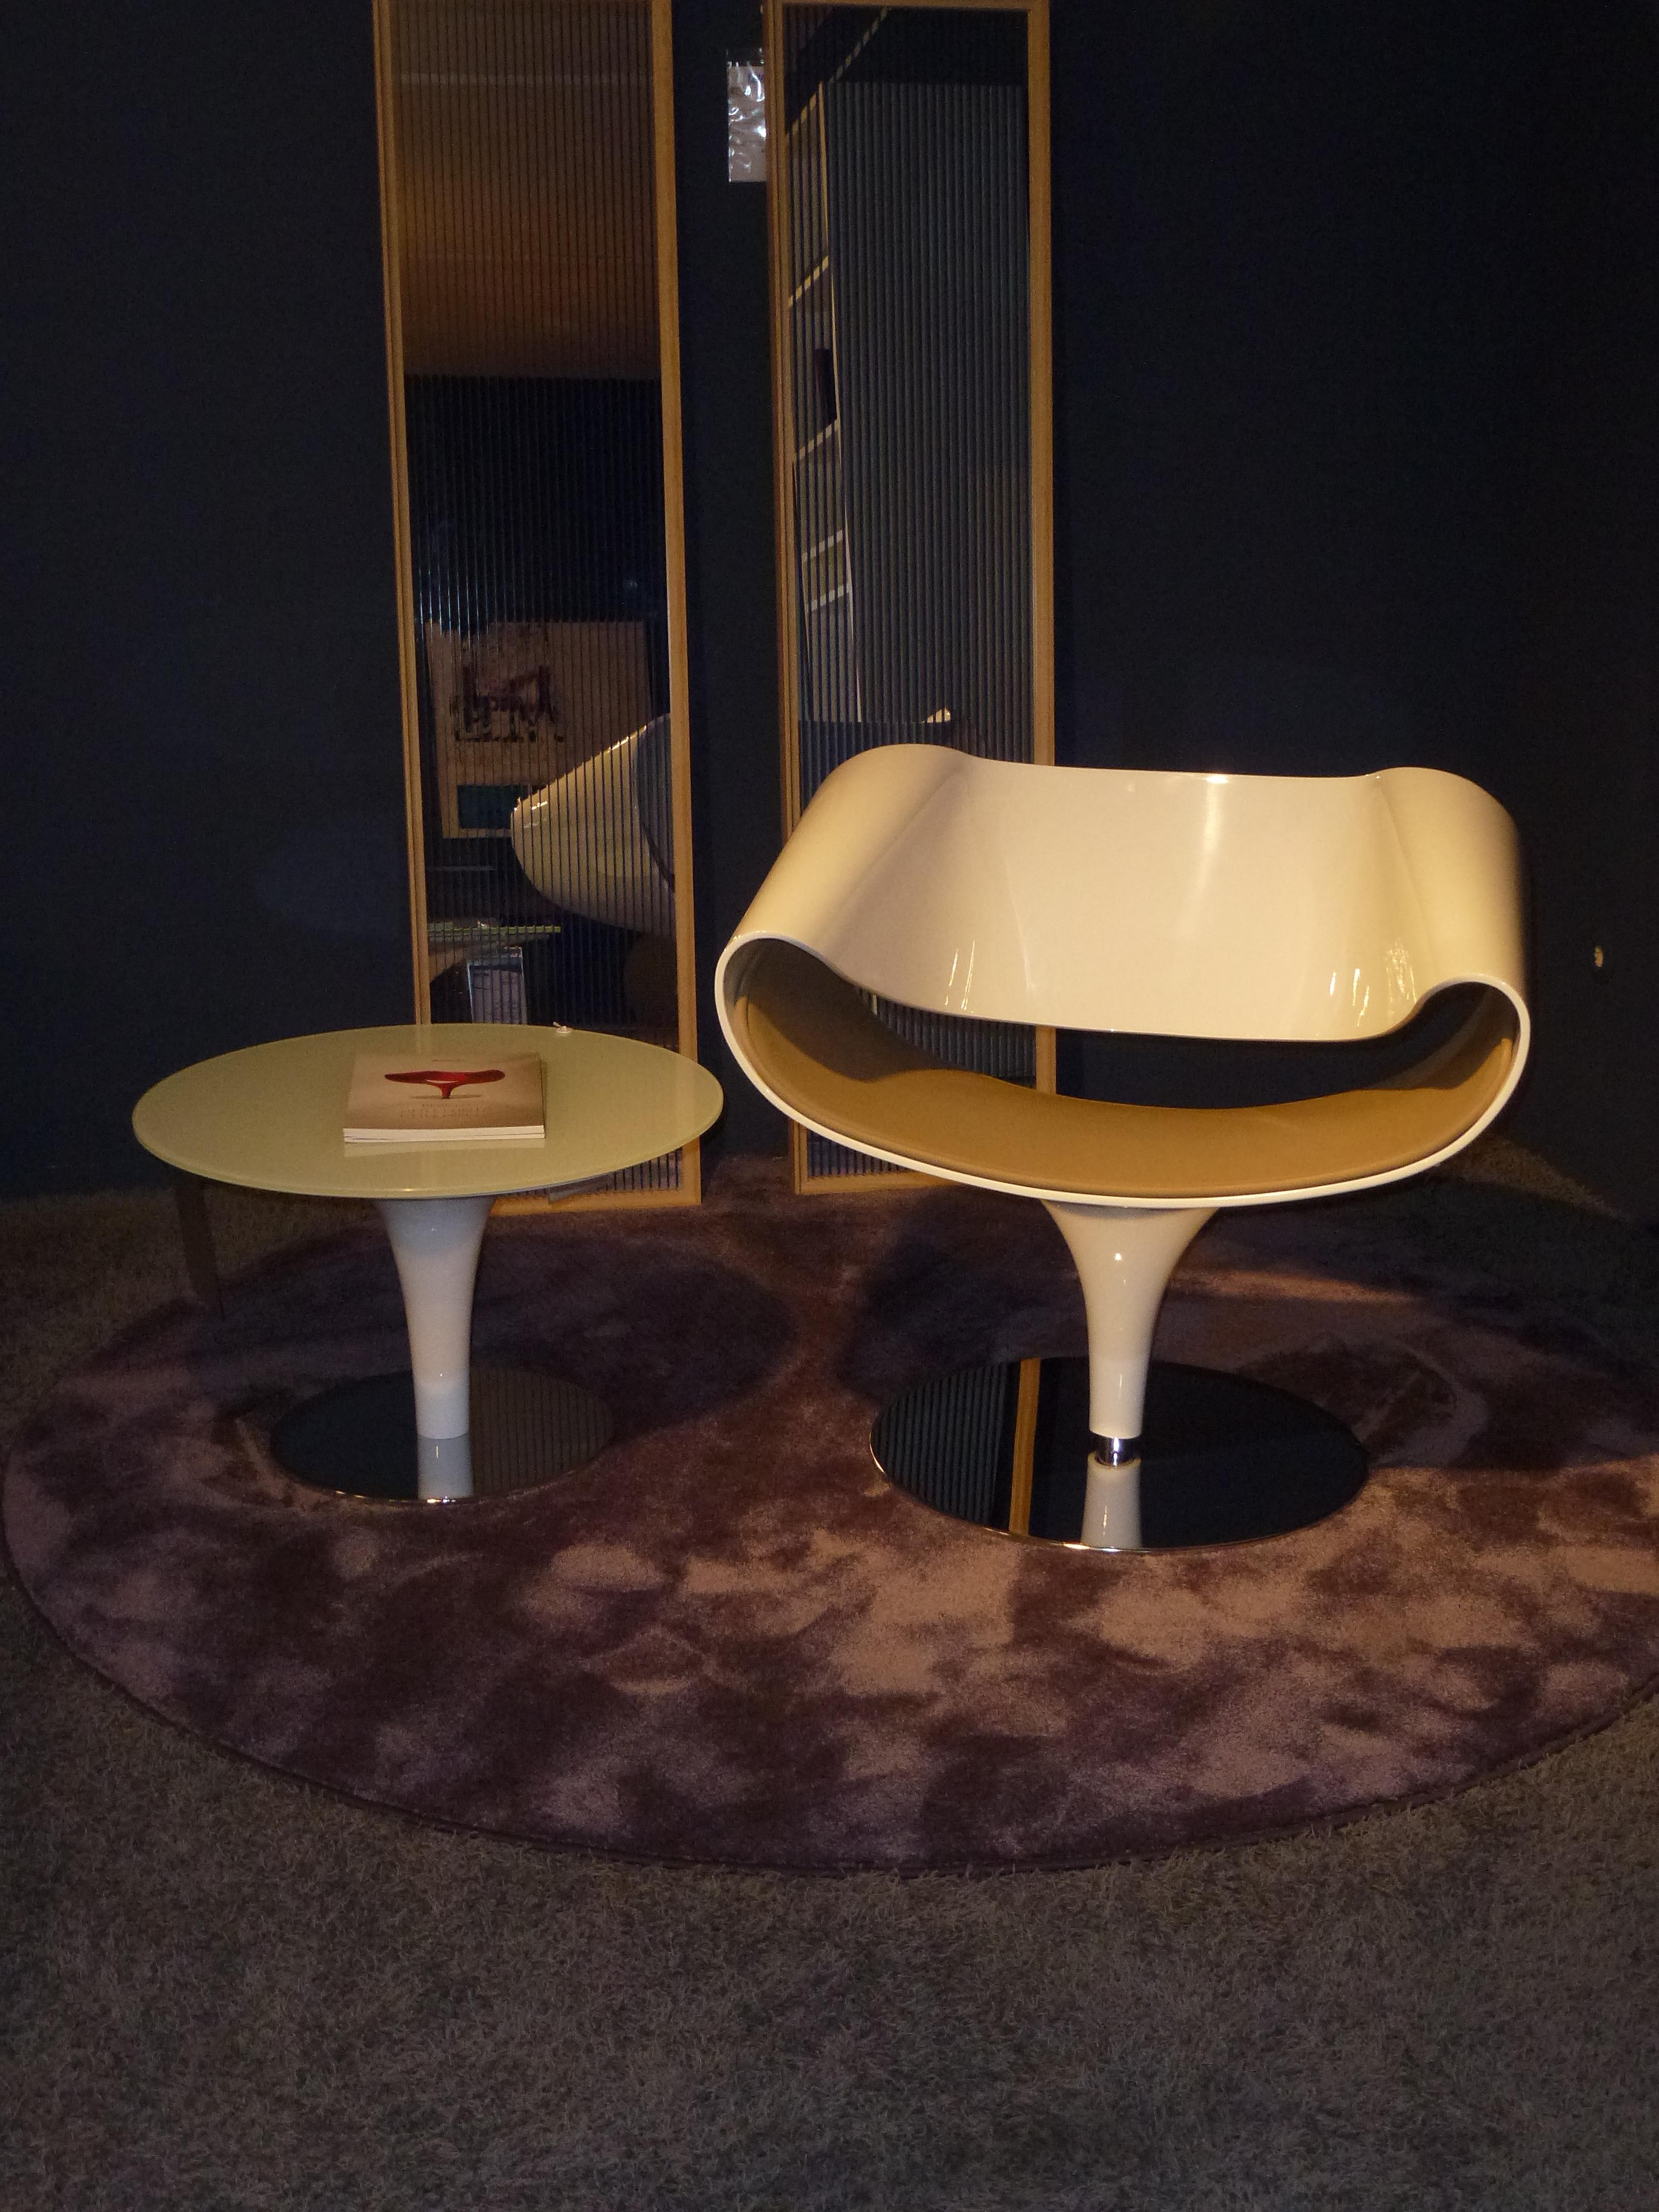 Möbel Braum DAUPHIN HOME Perillo